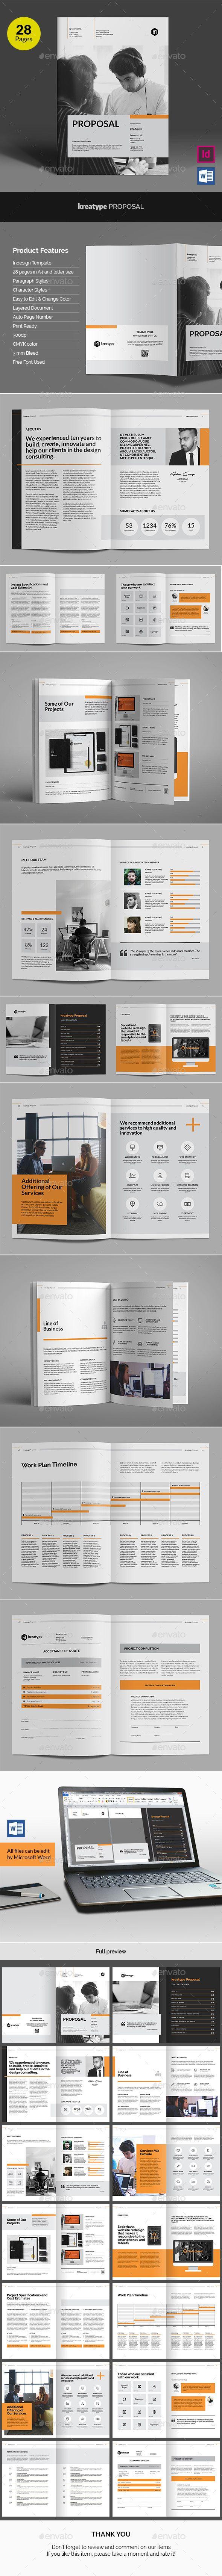 Kreatype Business Proposal v04 — InDesign INDD #report #word